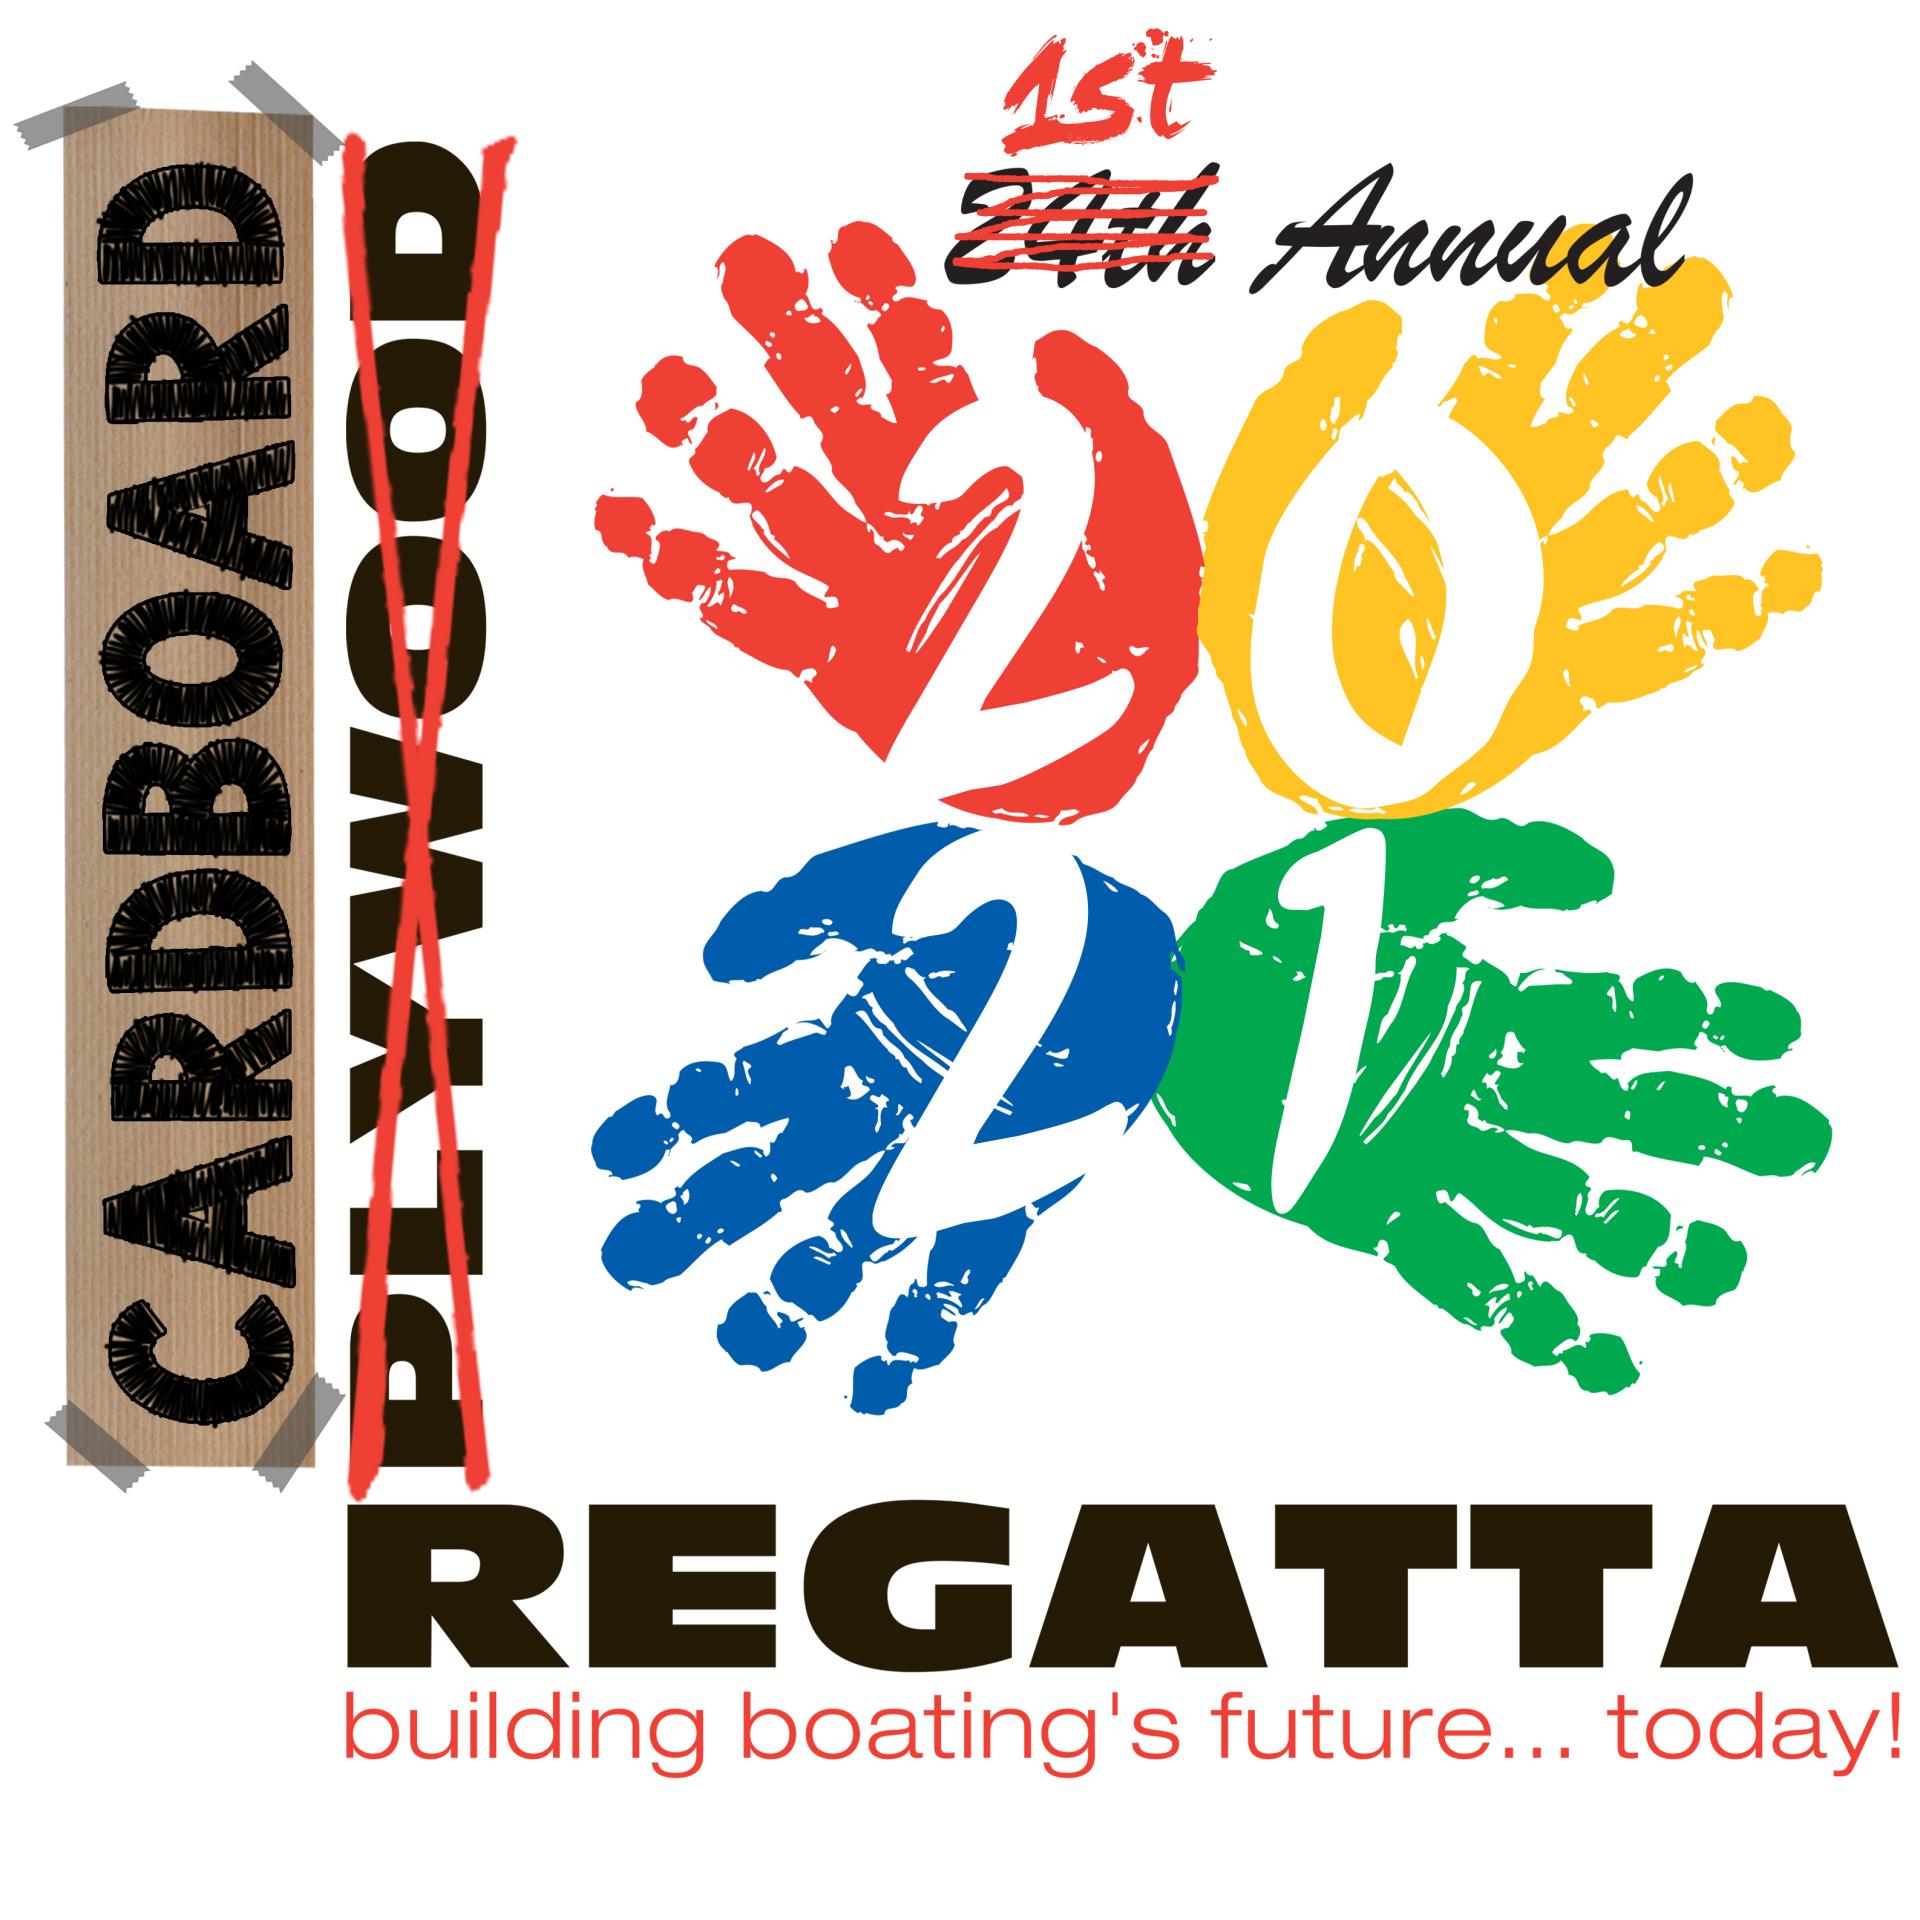 Announcing the 1st Annual Cardboard Regatta!